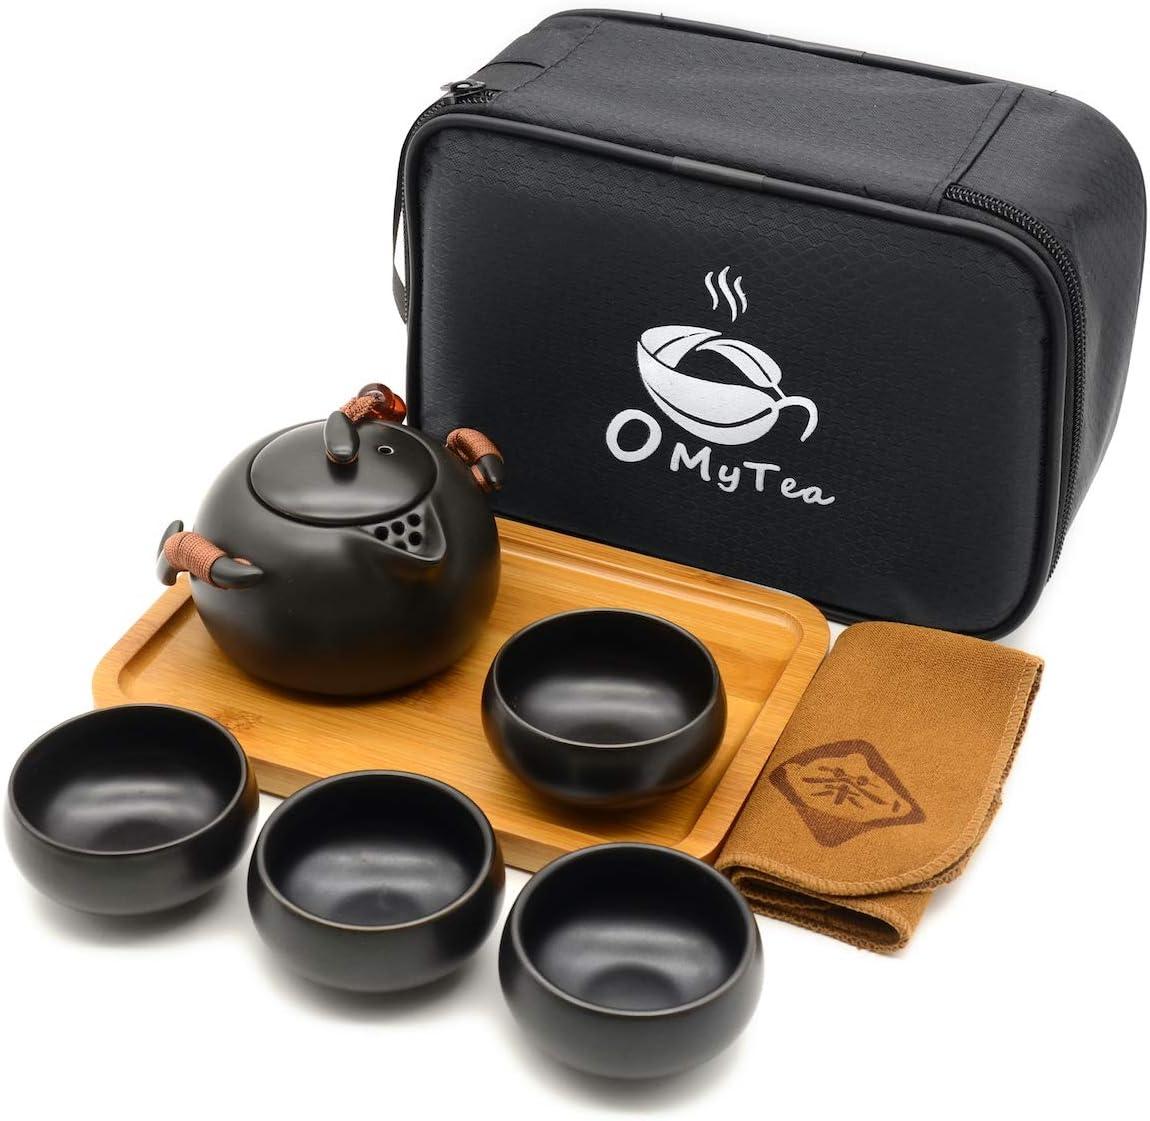 OMyTea Travel Japanese Tea Set - Max 78% OFF Asian Very popular Kung Po Chinese Fu Gongfu